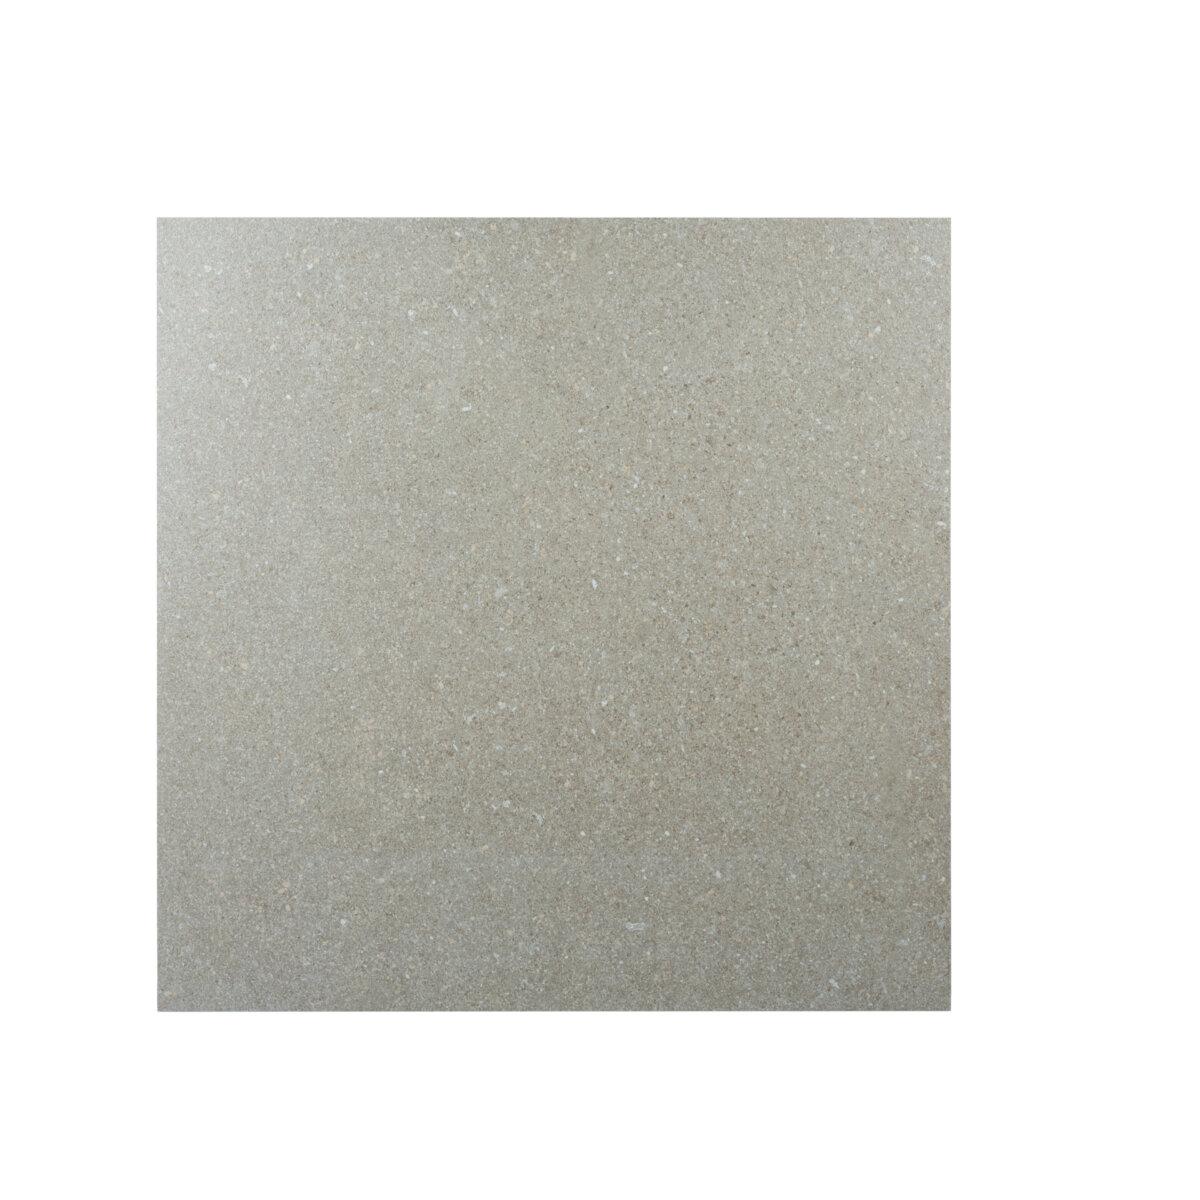 Quartz Grey Matt 600x600mm_Stiles_Product_Image